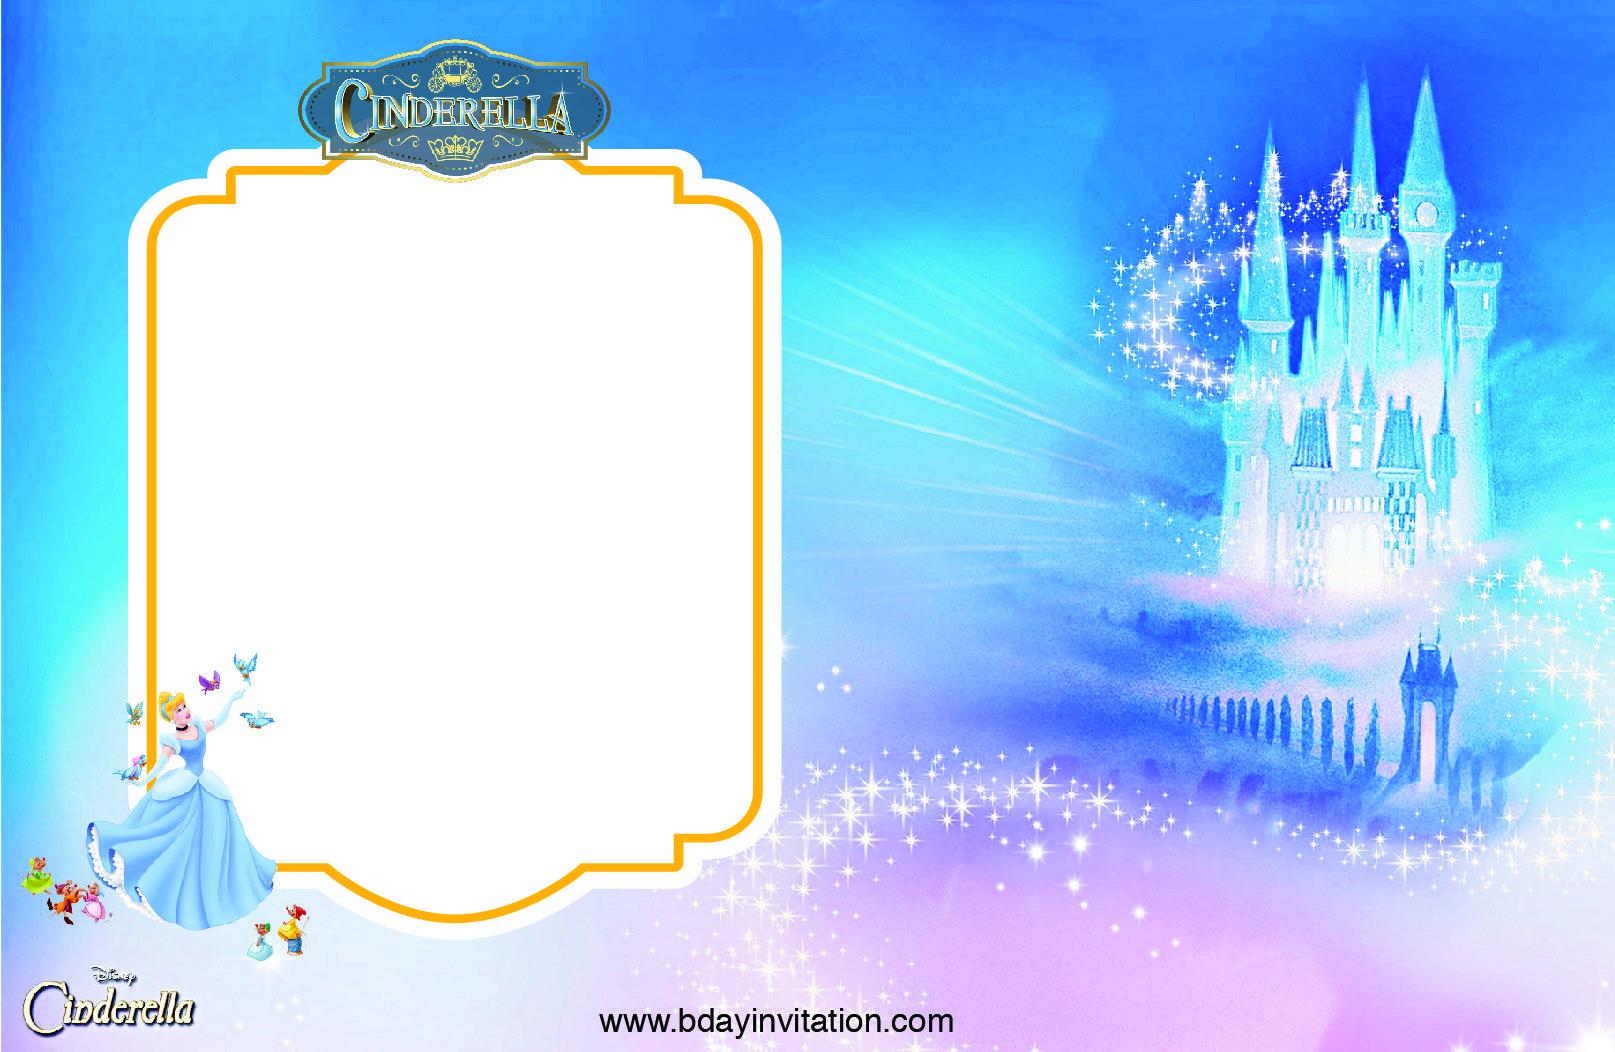 Get FREE Printable Disney Cinderella Party Invitation Template